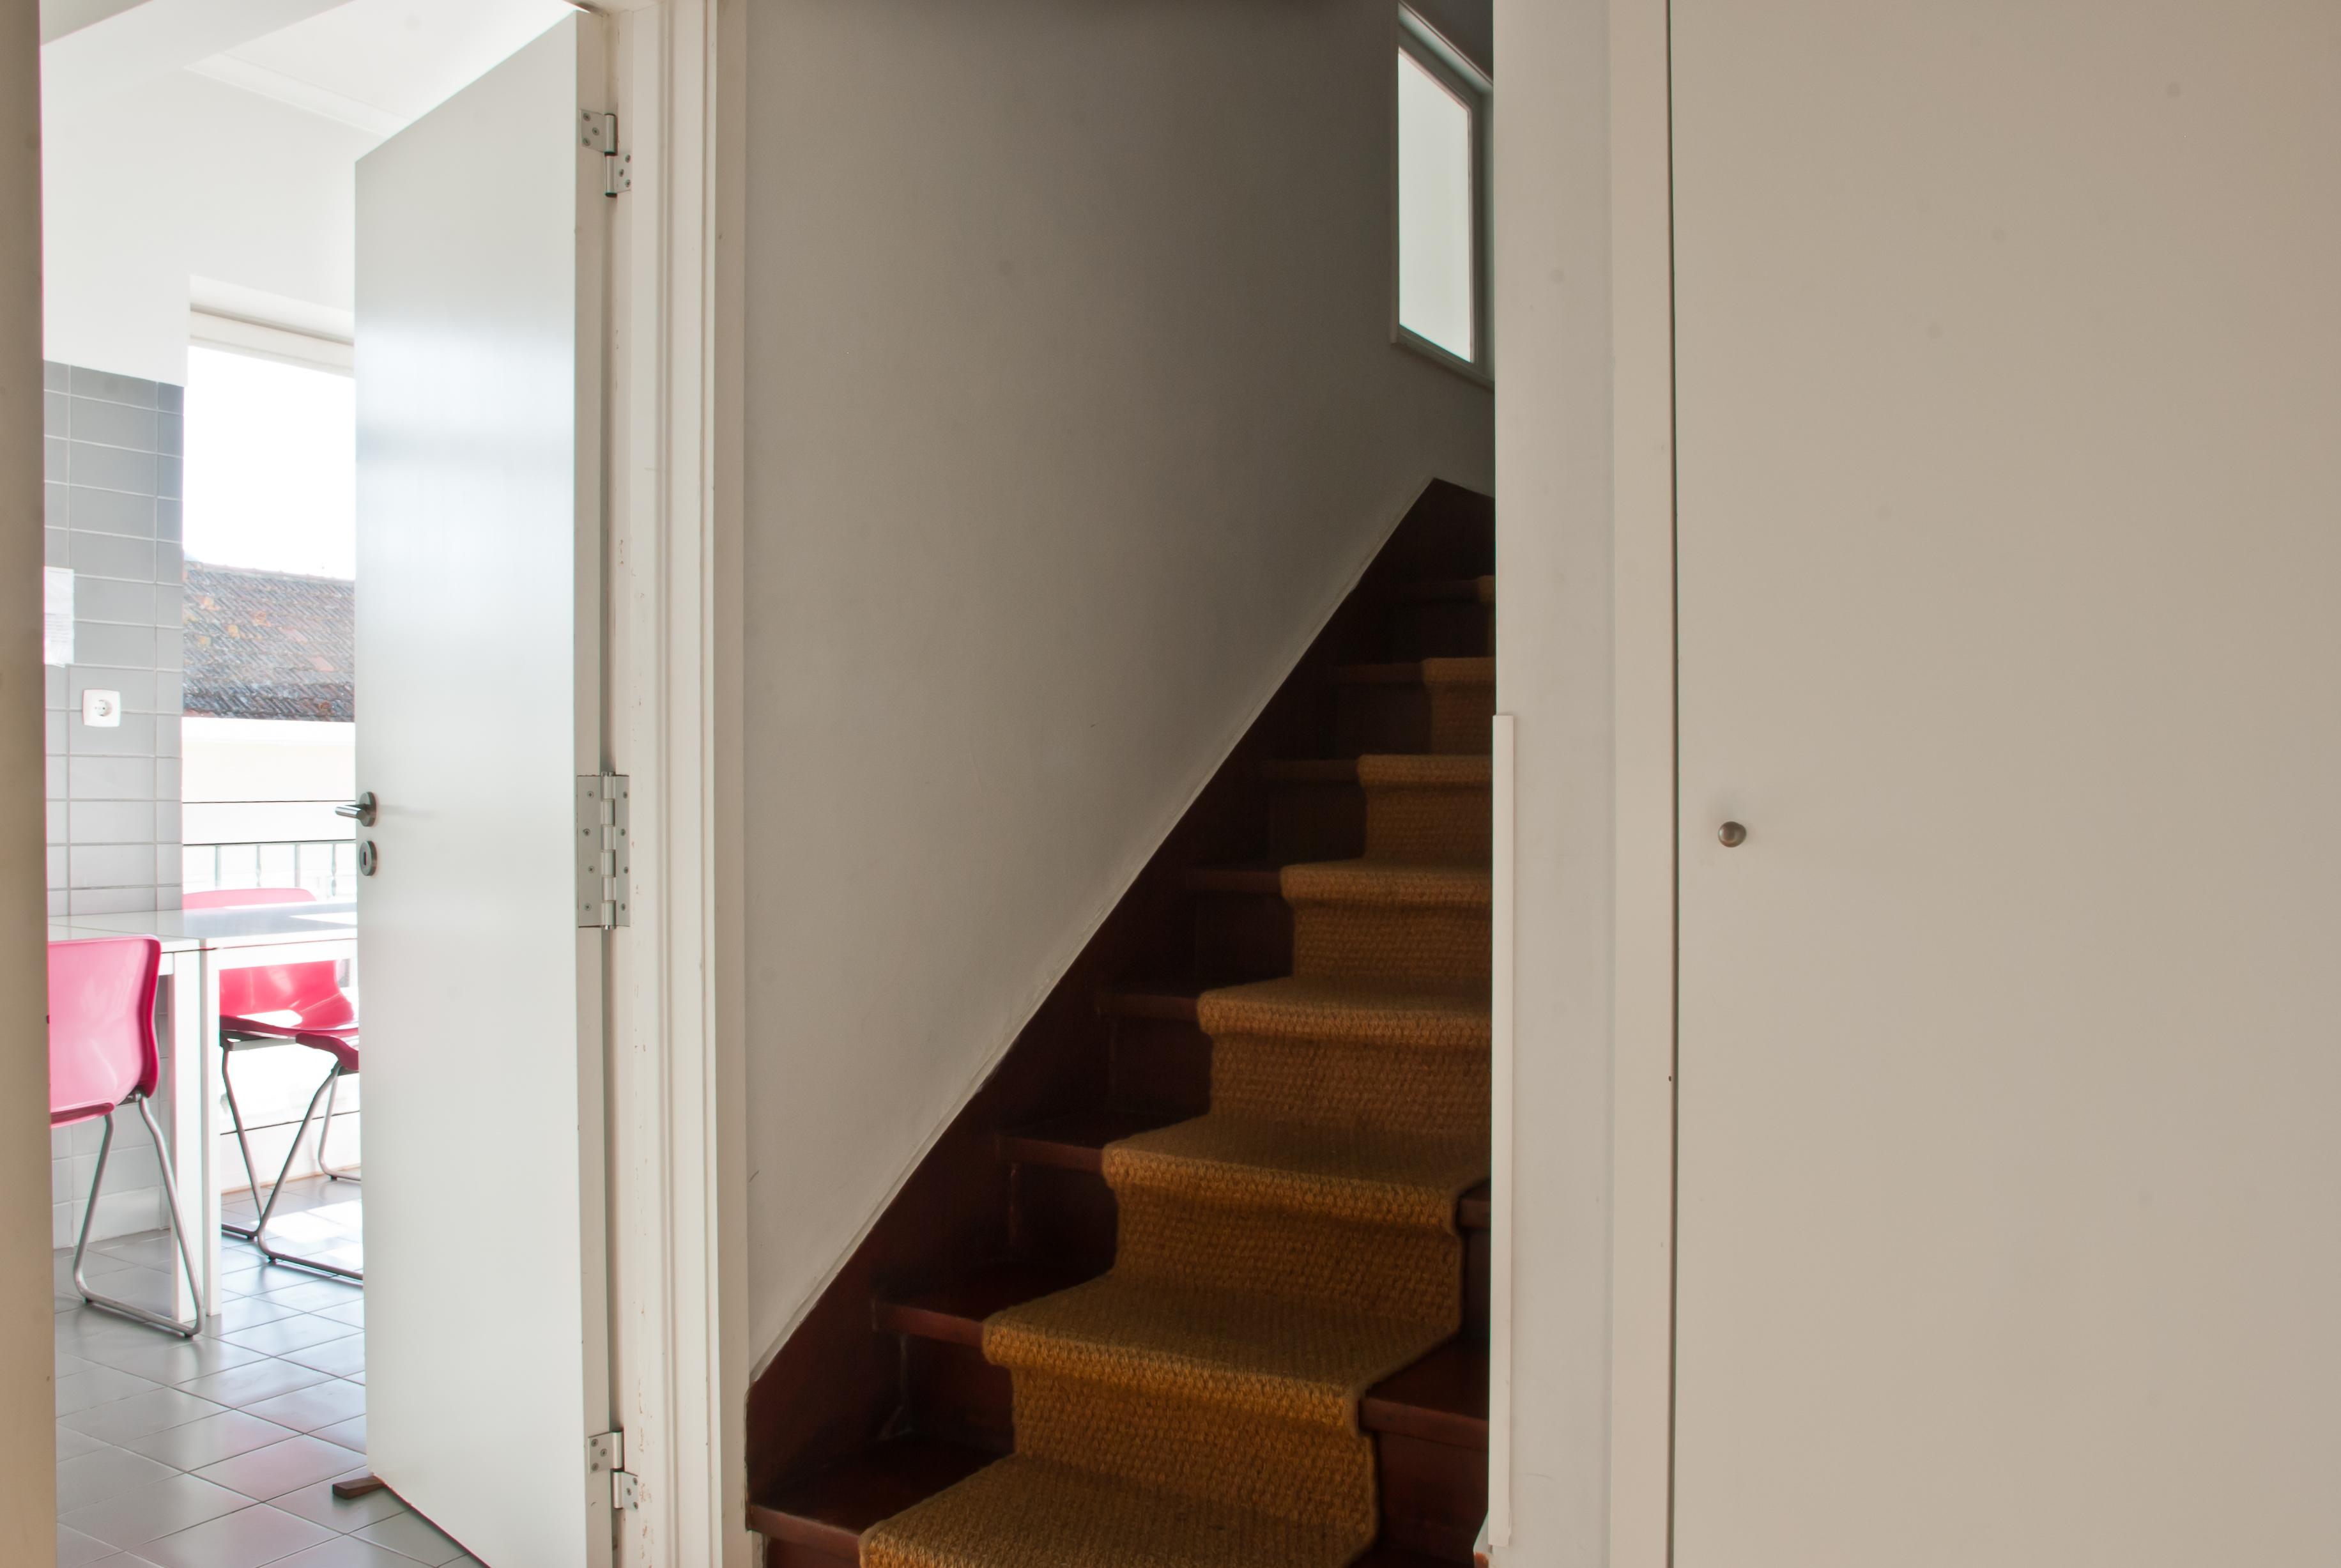 AB - Geral - Foto 1 - Acesso piso supeior.Acces floor above.jpg